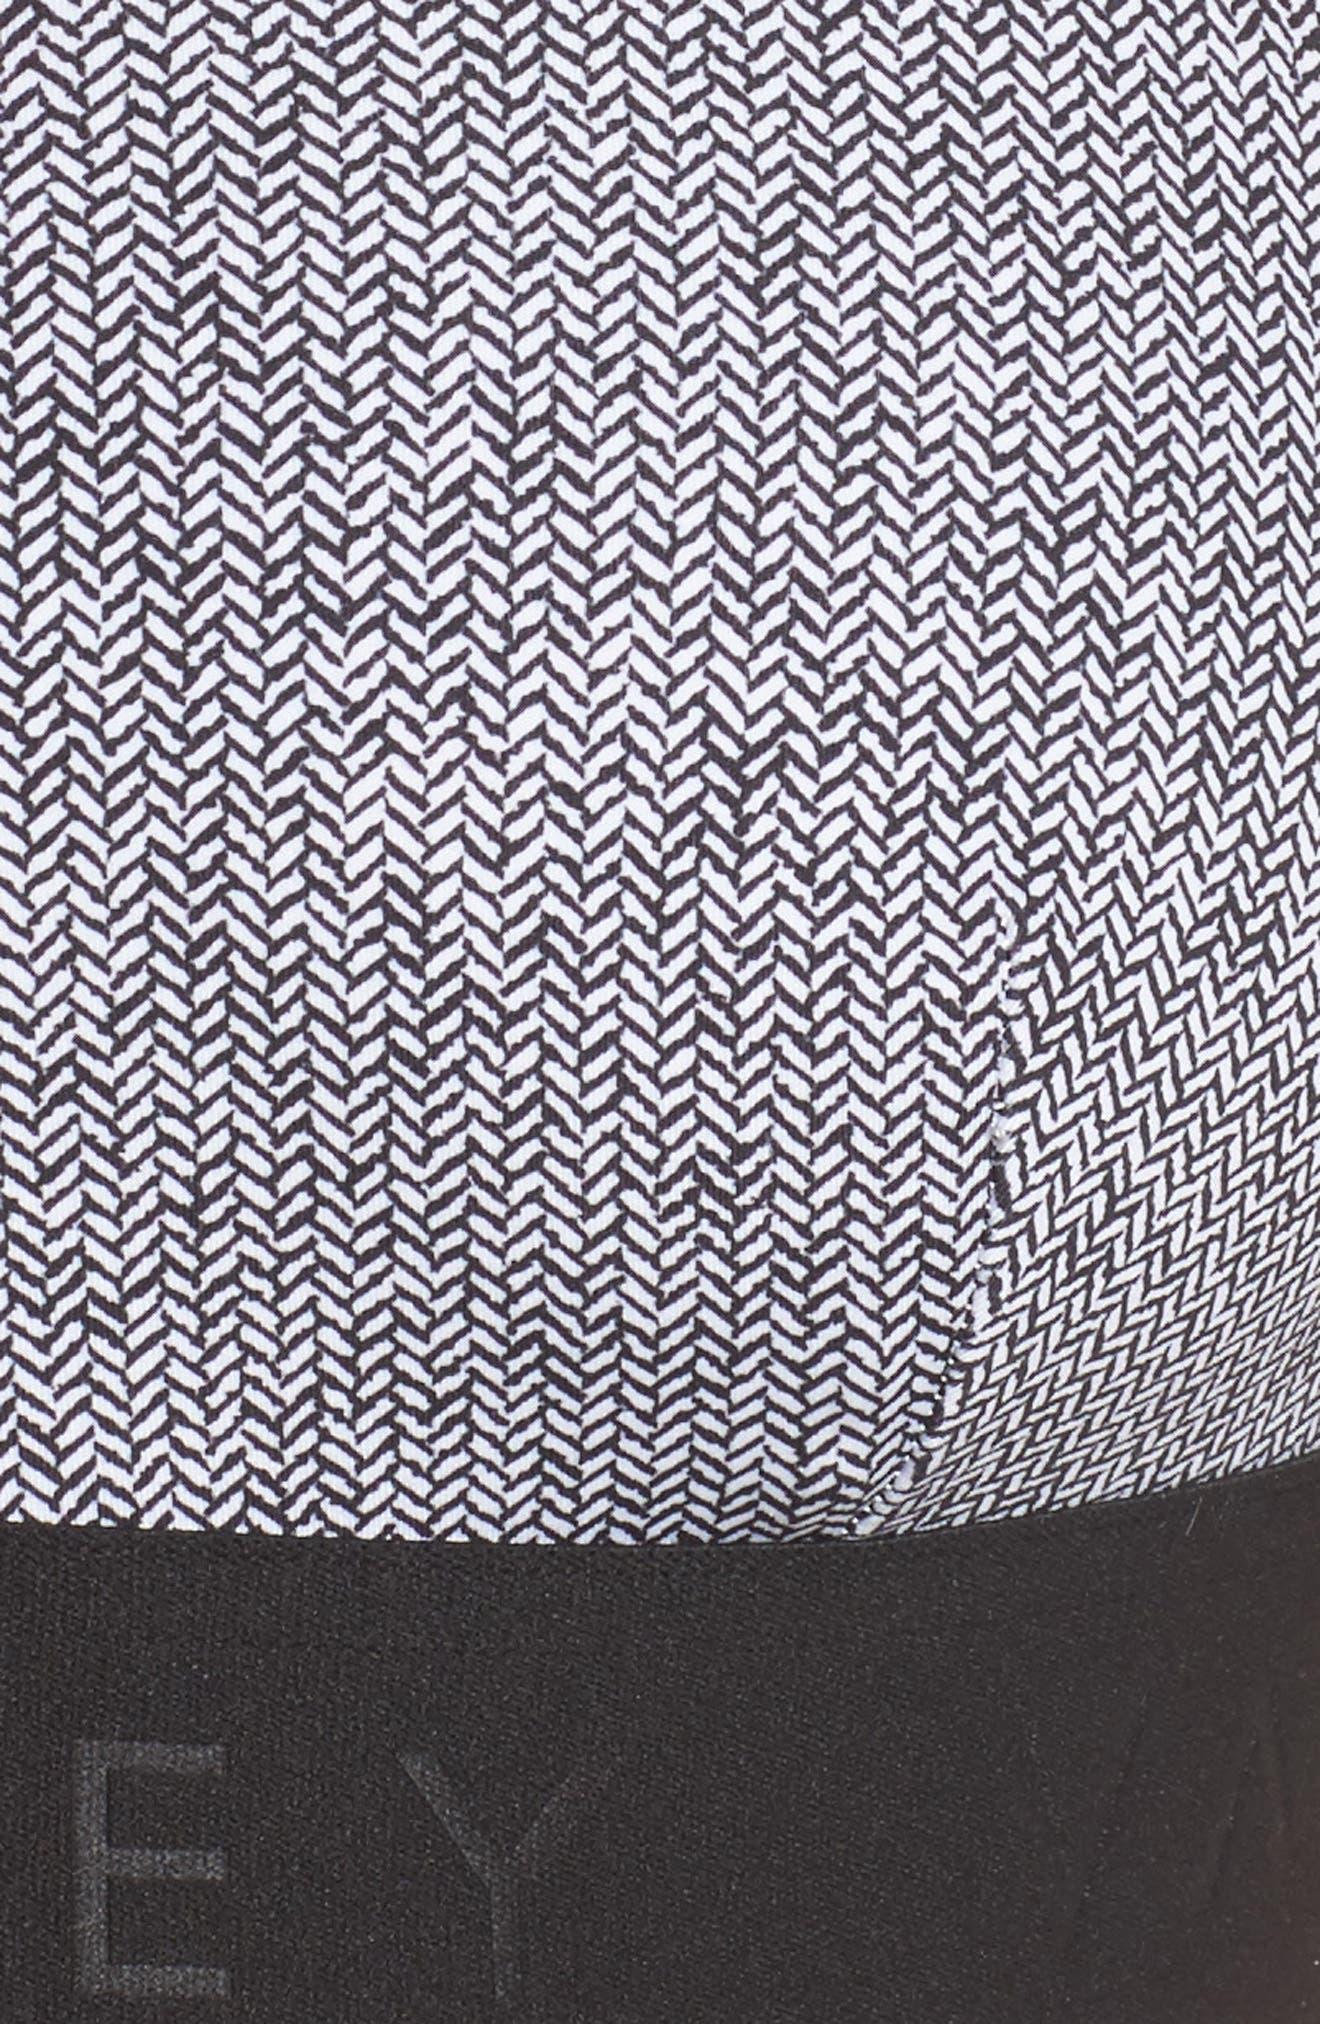 Gale Sports Bra,                             Alternate thumbnail 4, color,                             Black/ White Herringbone Print